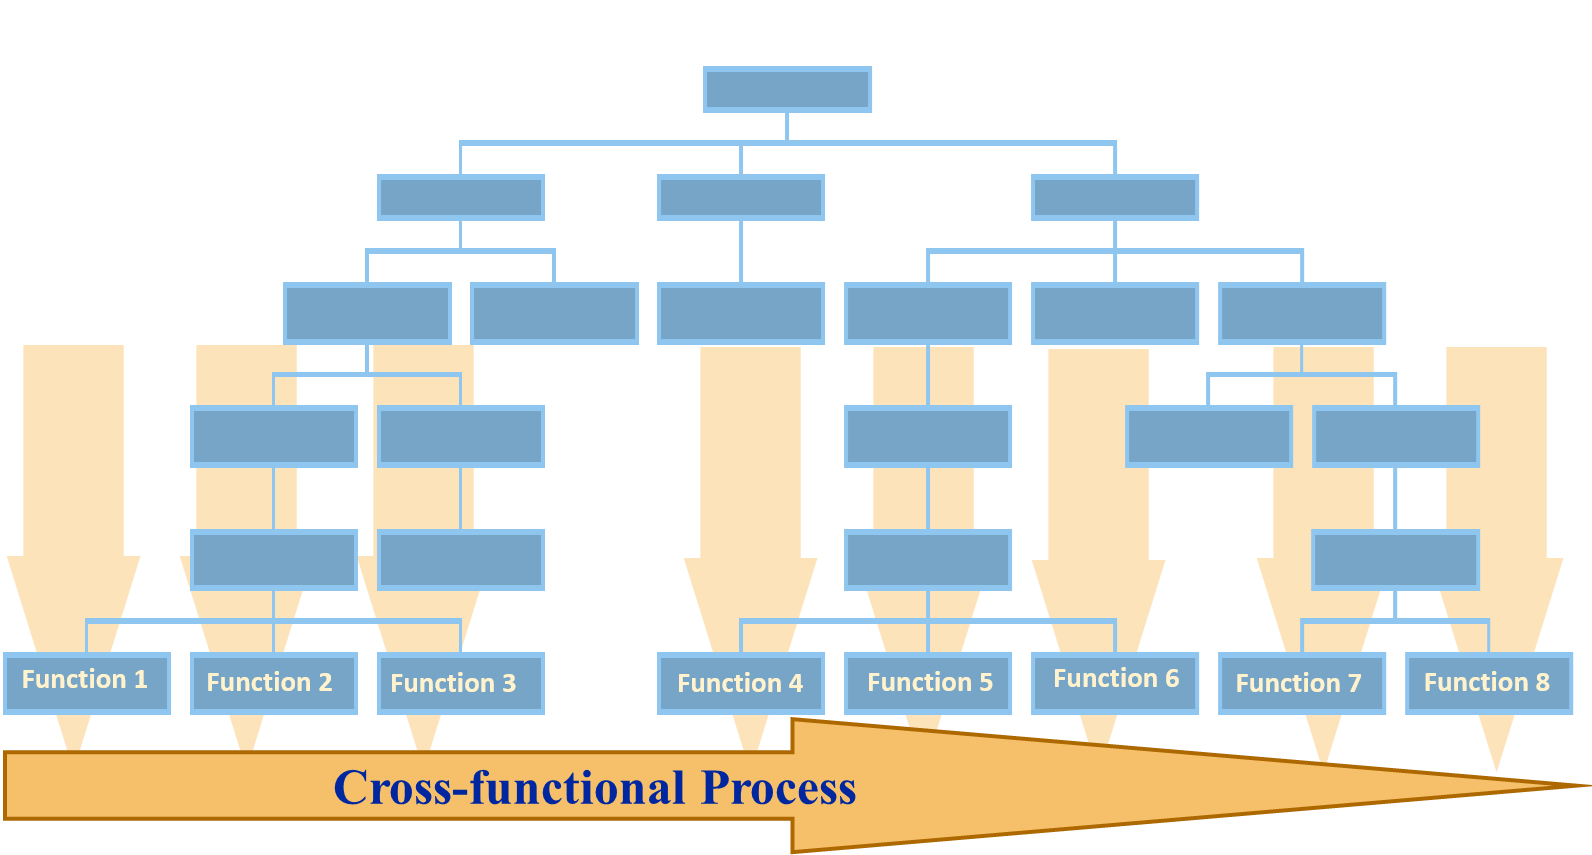 Cross-functional process overlaying hierarchical organization chart- Process Analysis